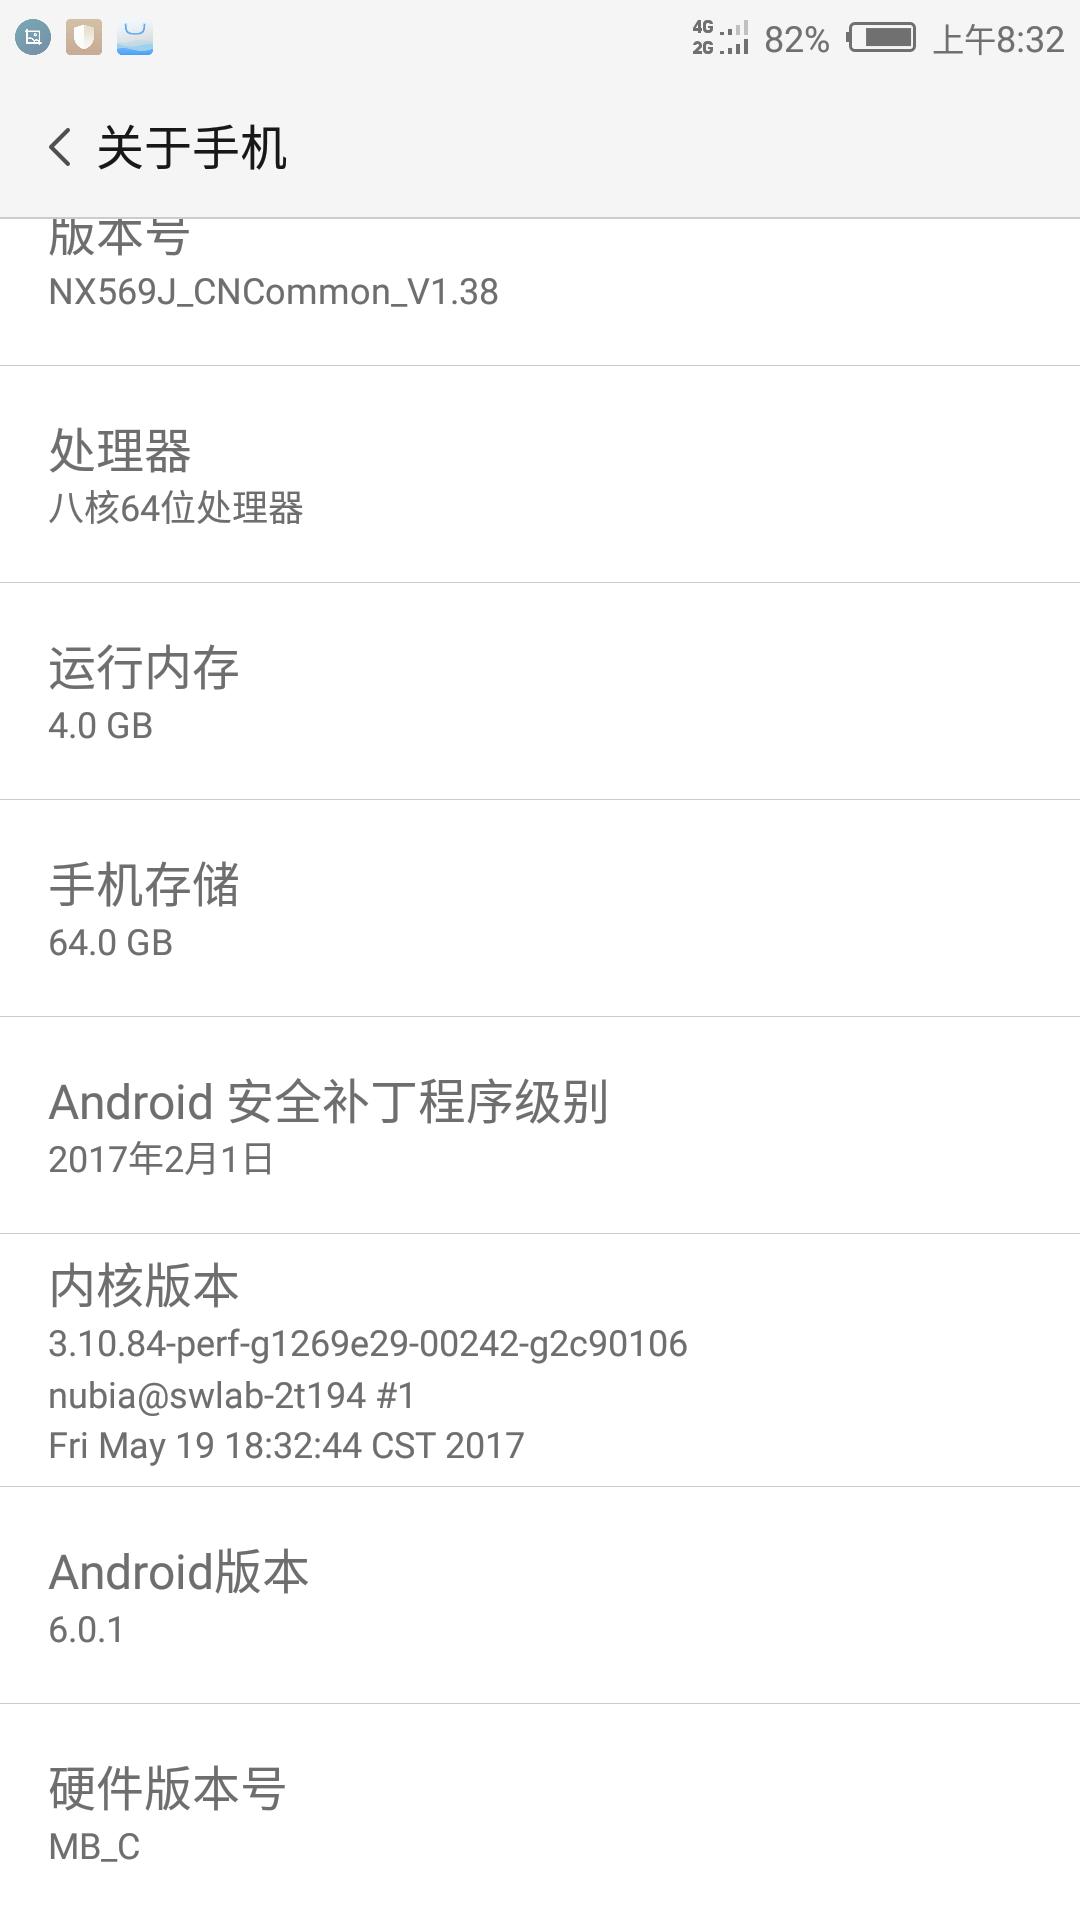 Screenshot_2017-06-03-08-32-15.png